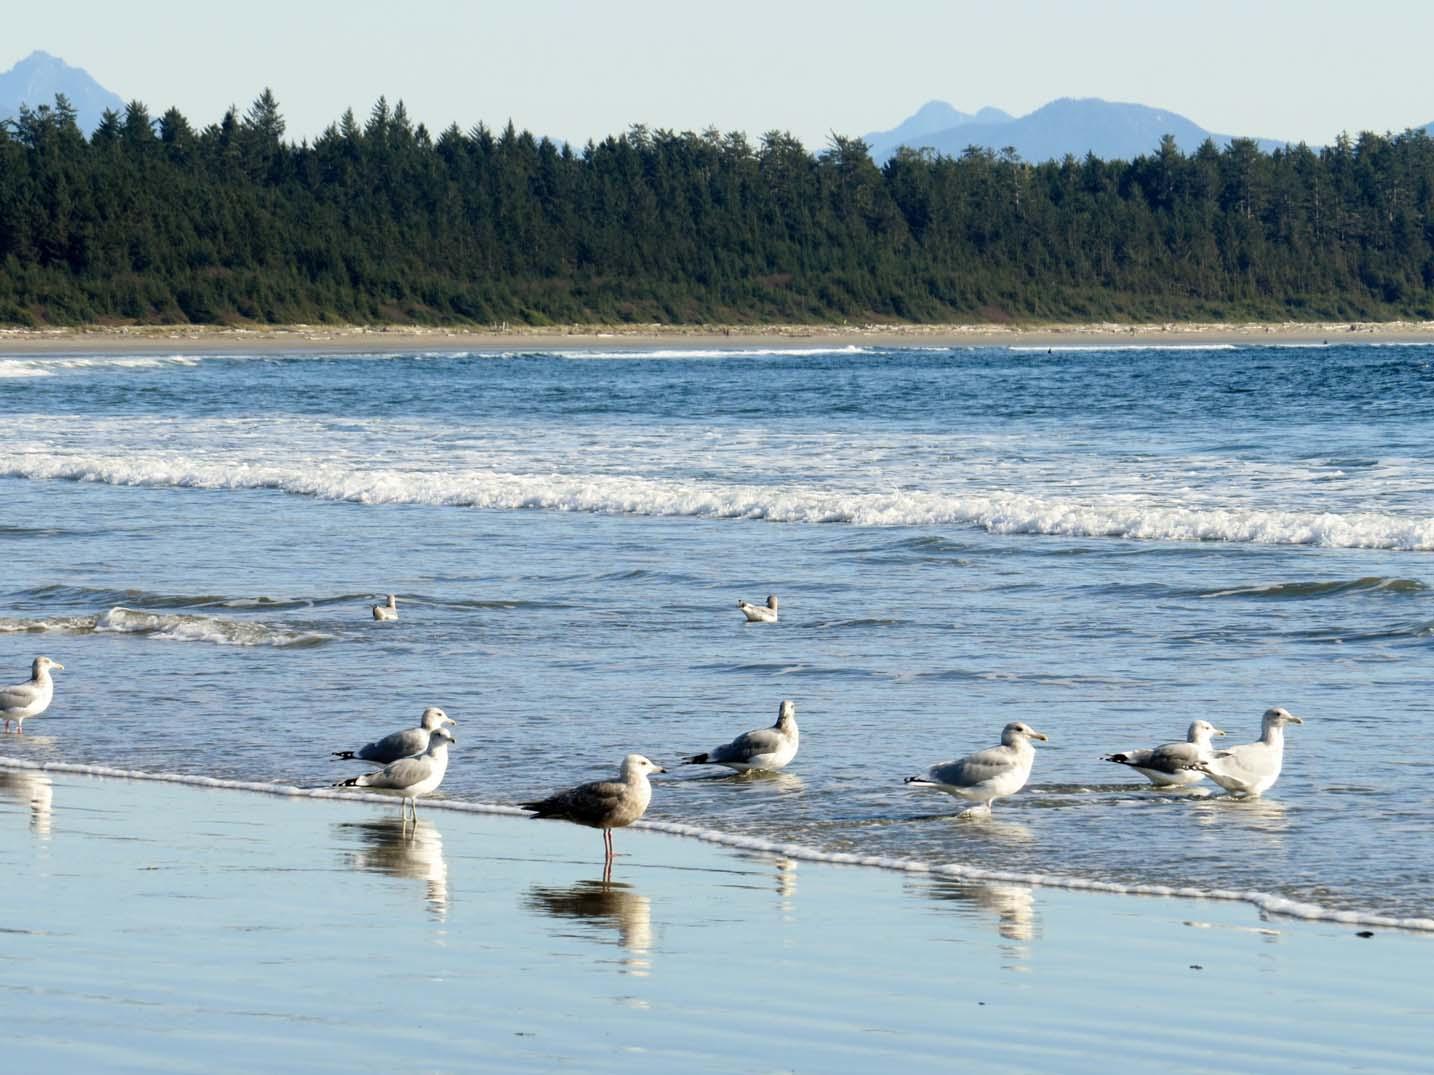 Birds on the beach in Tofino